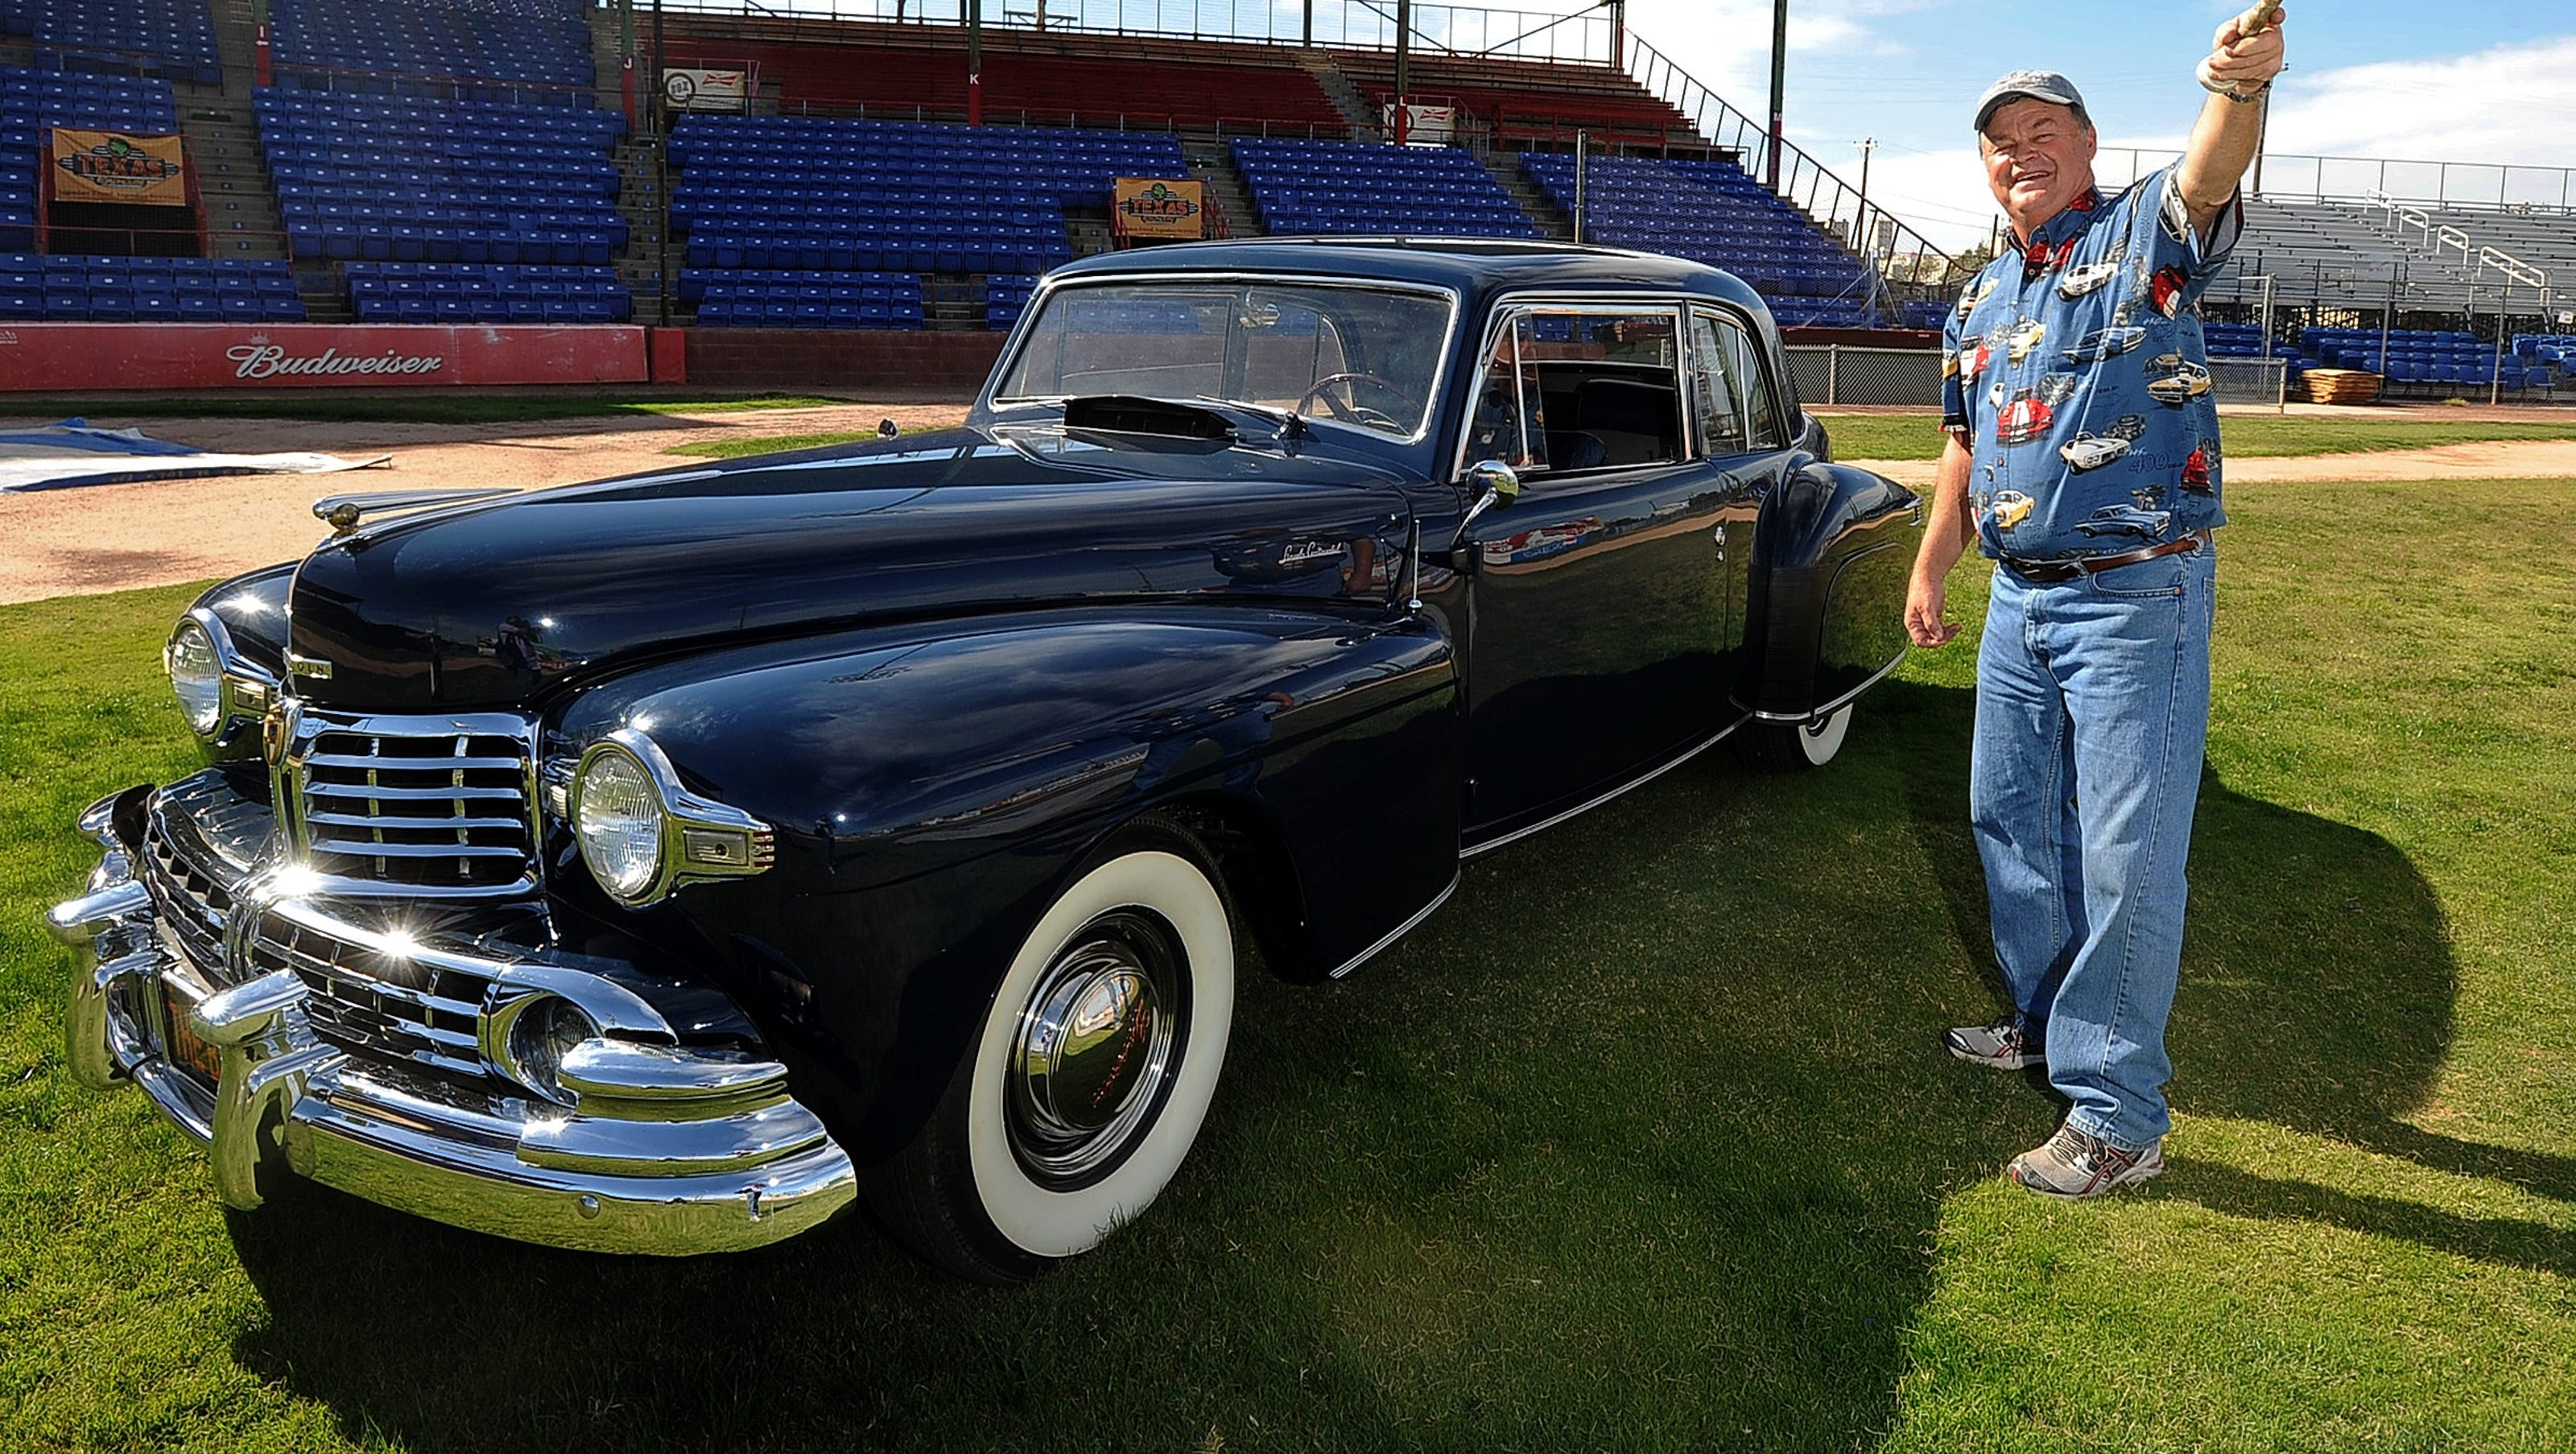 Baseball And Car Loving Texan Buys Babe Ruth S Lincoln